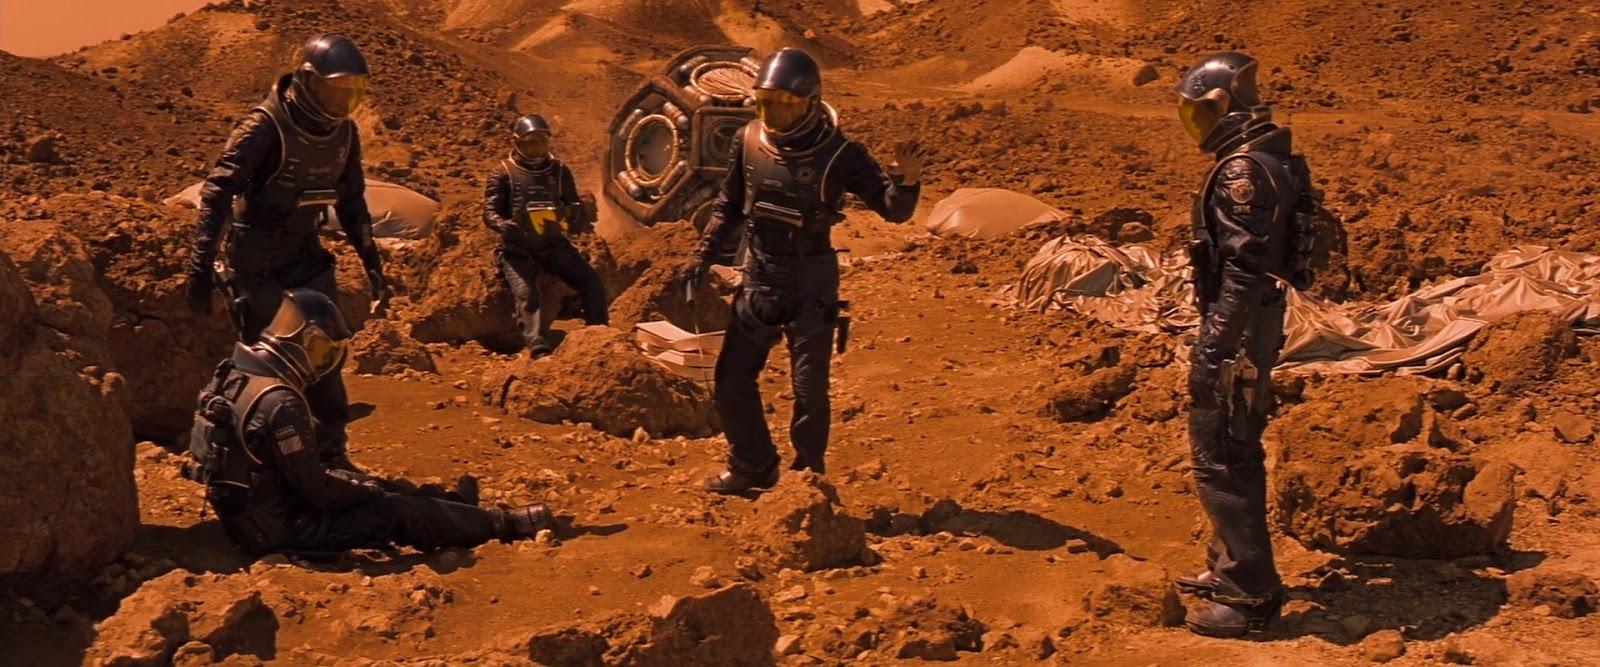 Image Gallery lost astronaut on mars